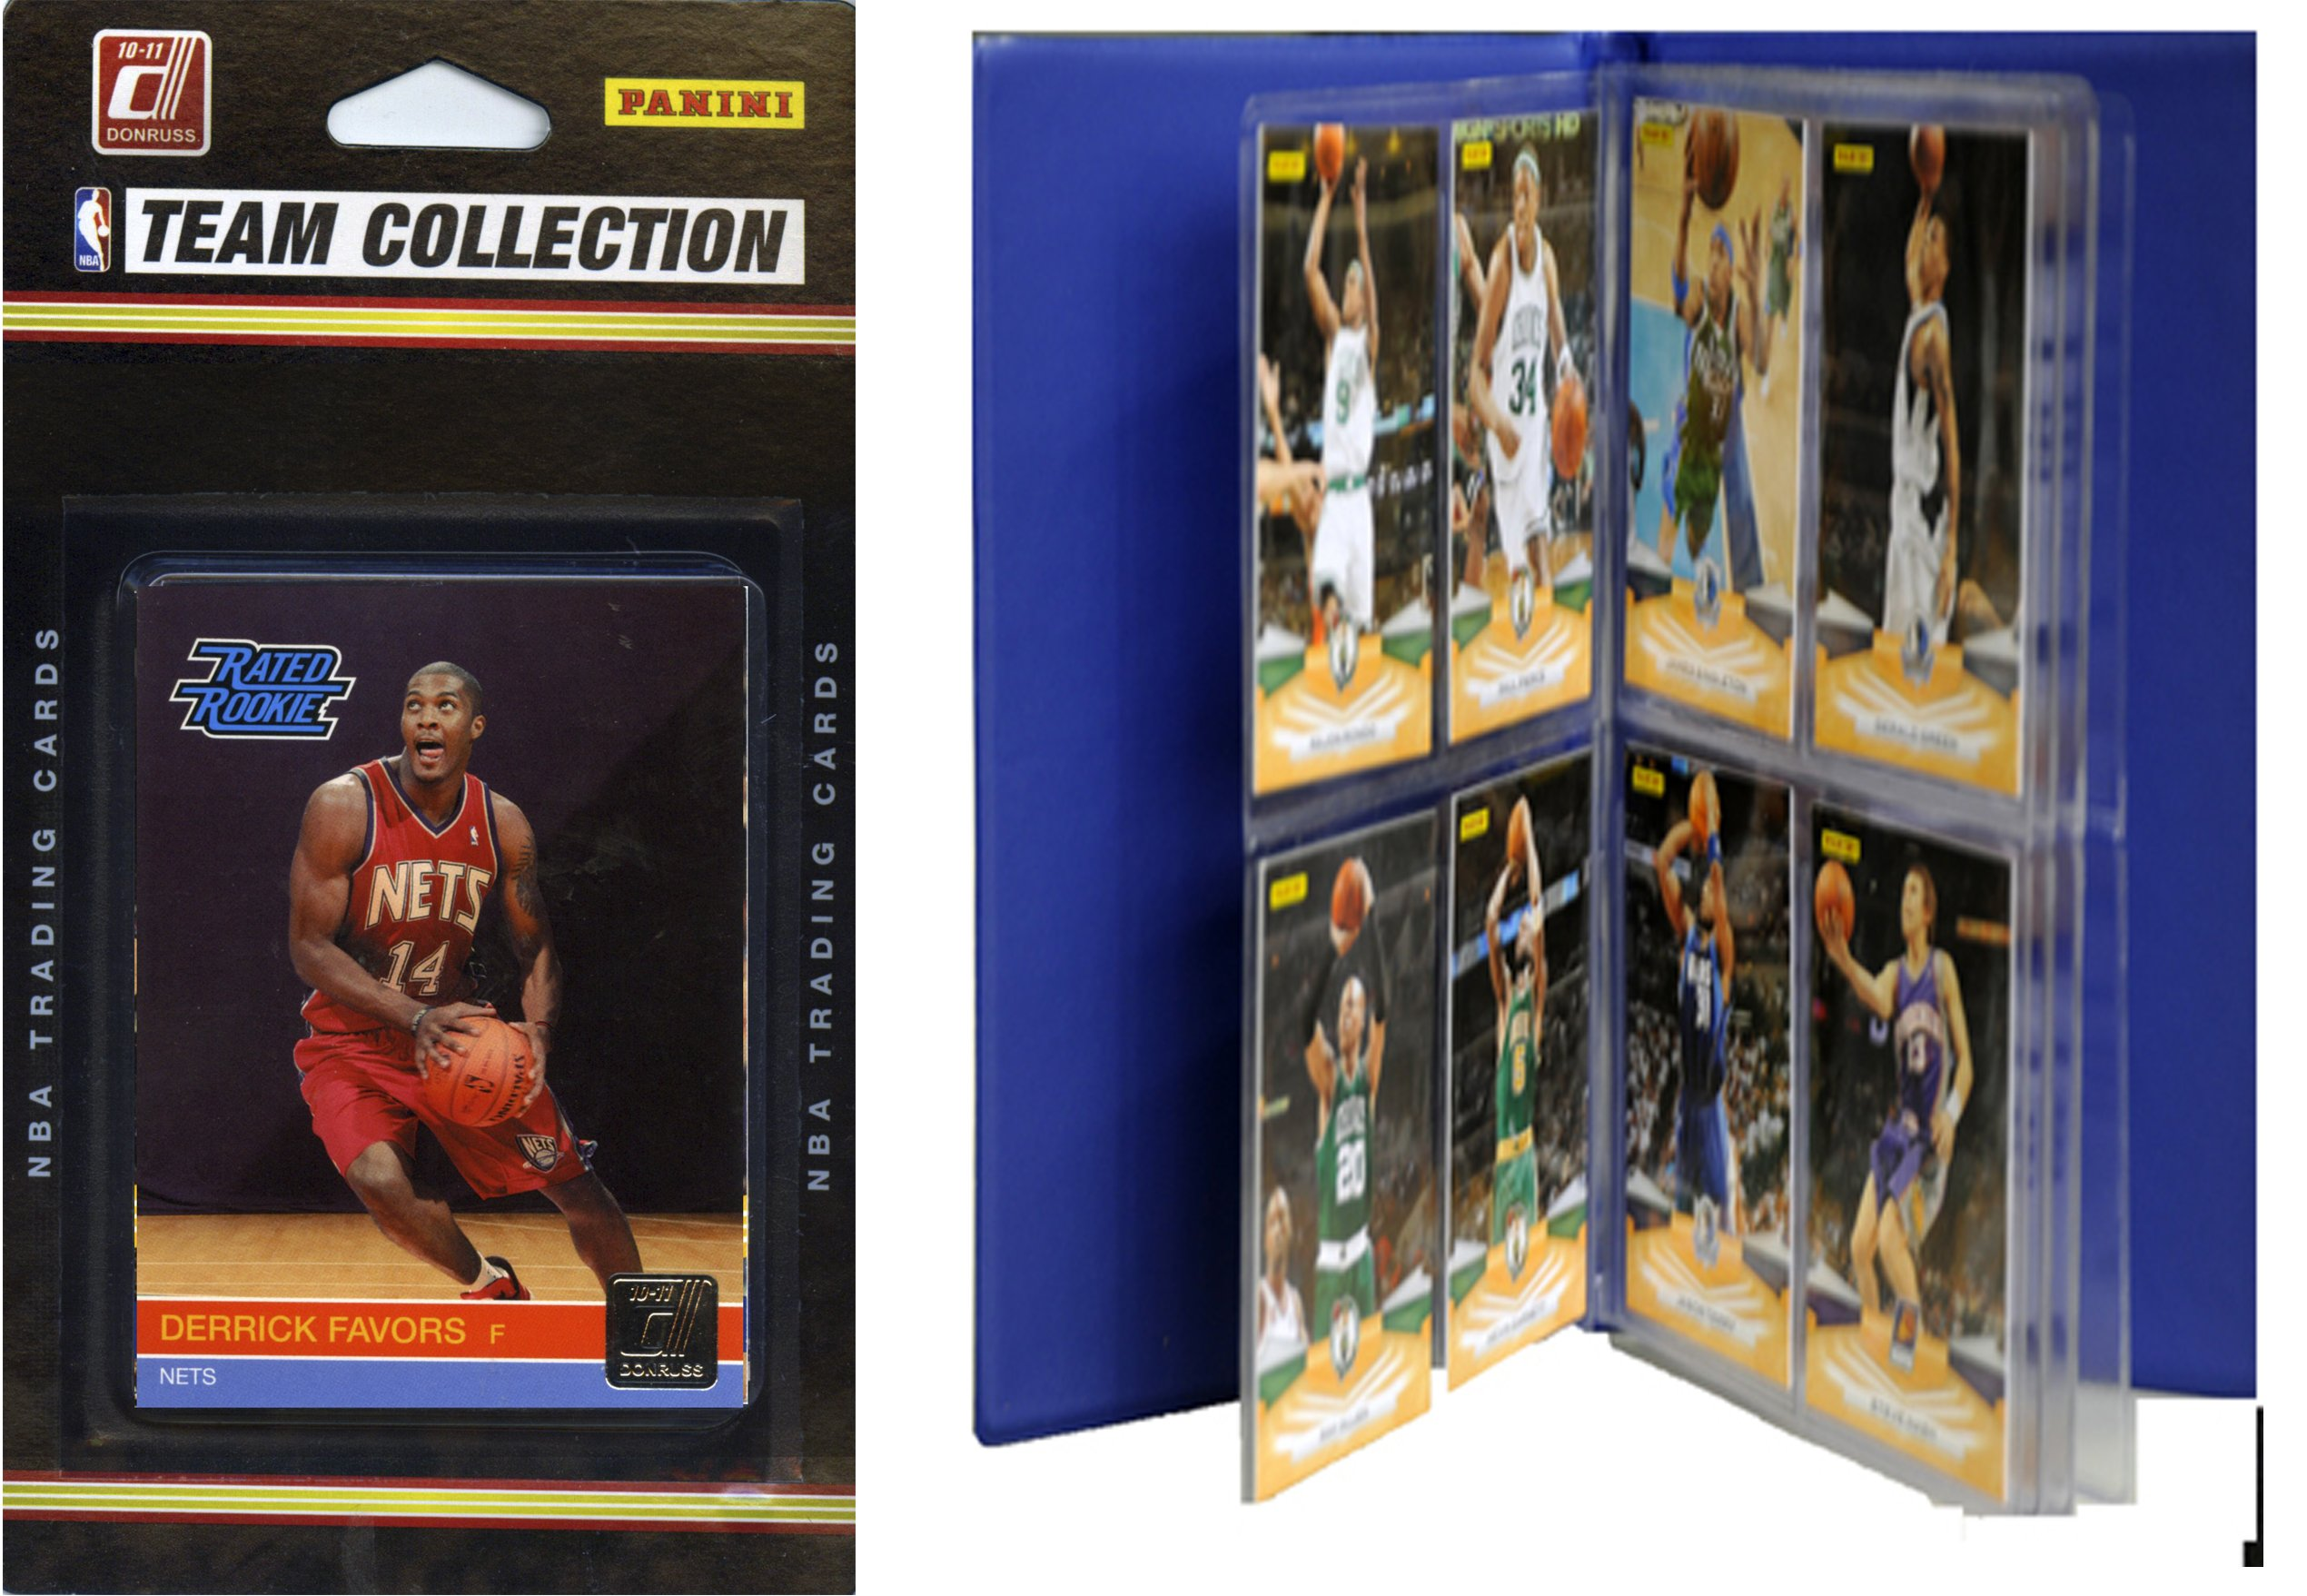 NBA New Jersey Nets Licensed 2010-11 Donruss Team Set Plus Storage Album